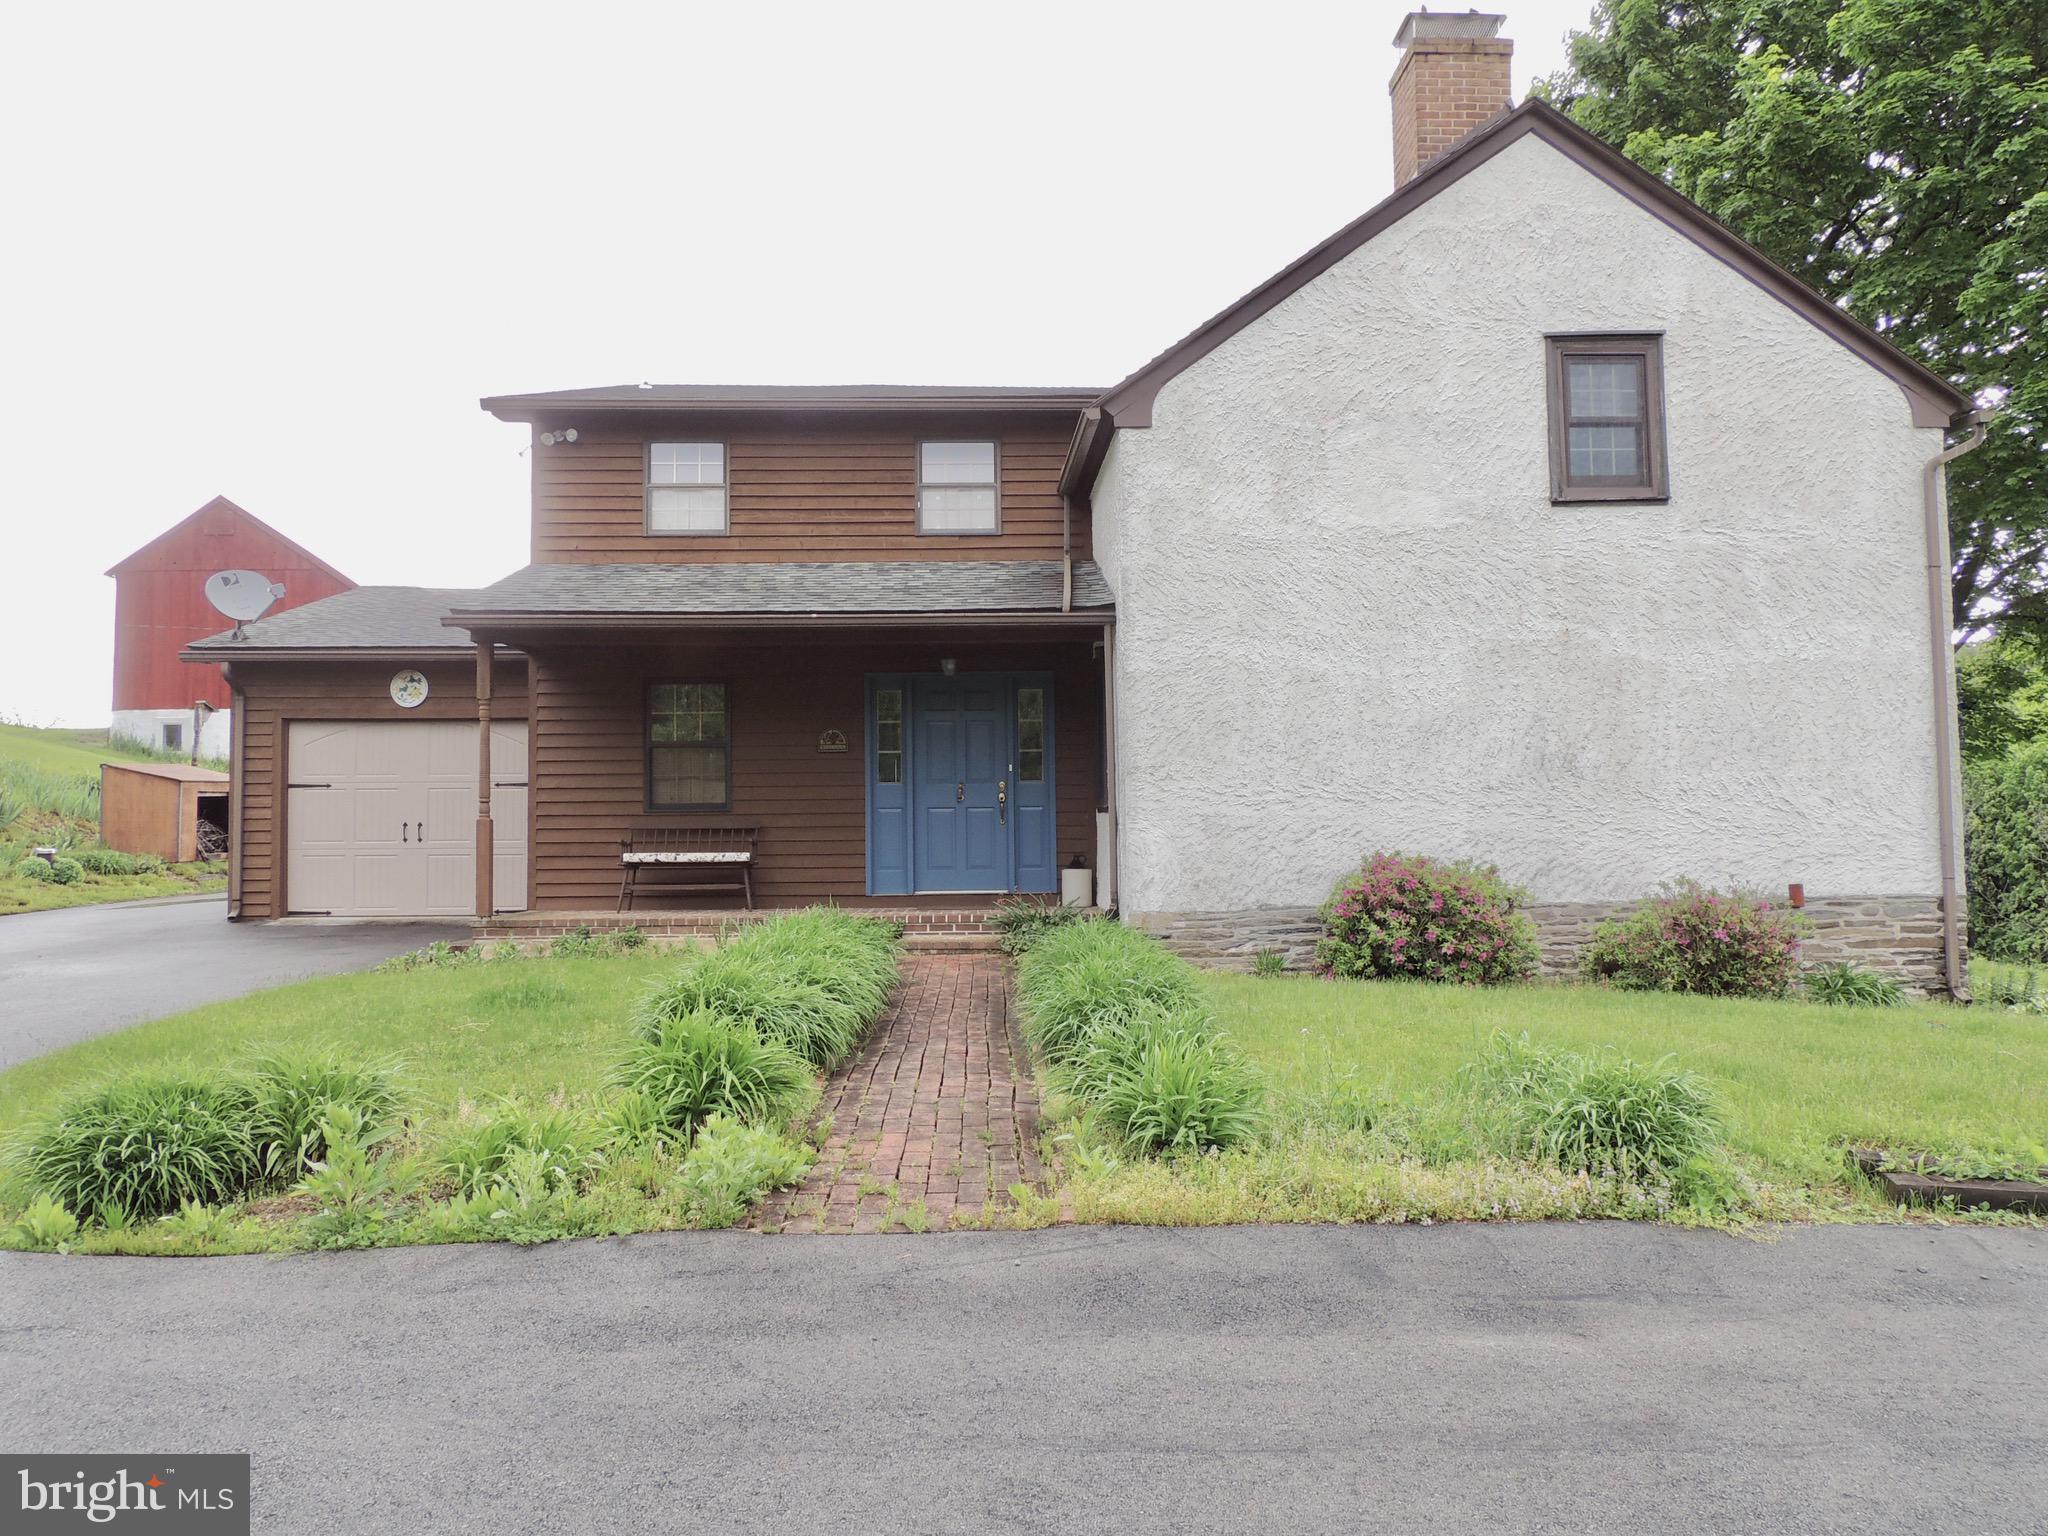 7599 CARPET ROAD, NEW TRIPOLI, PA 18066